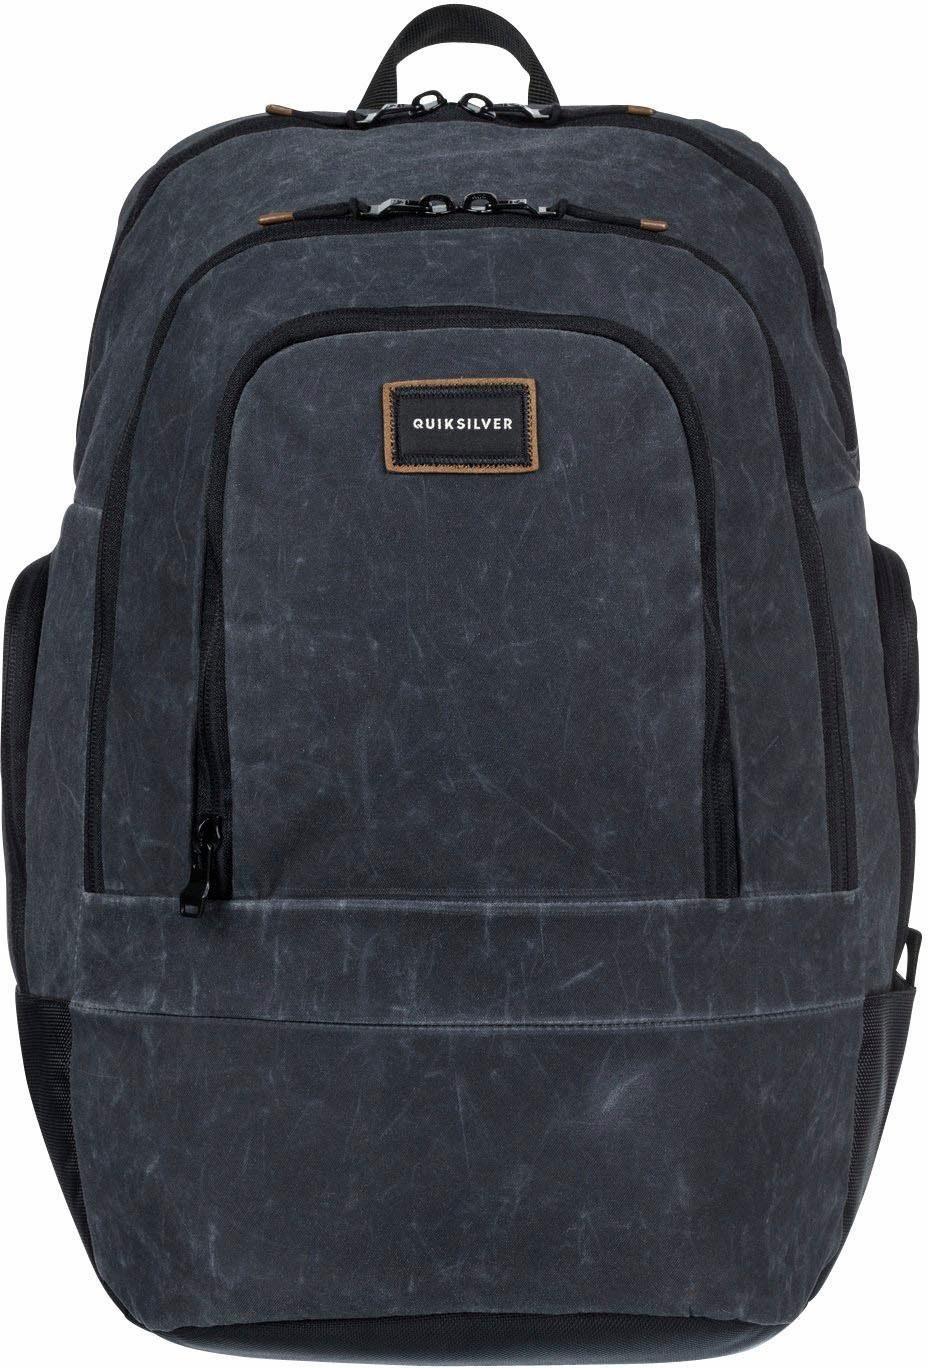 Quiksilver Cityrucksack, LaptopTabletfach